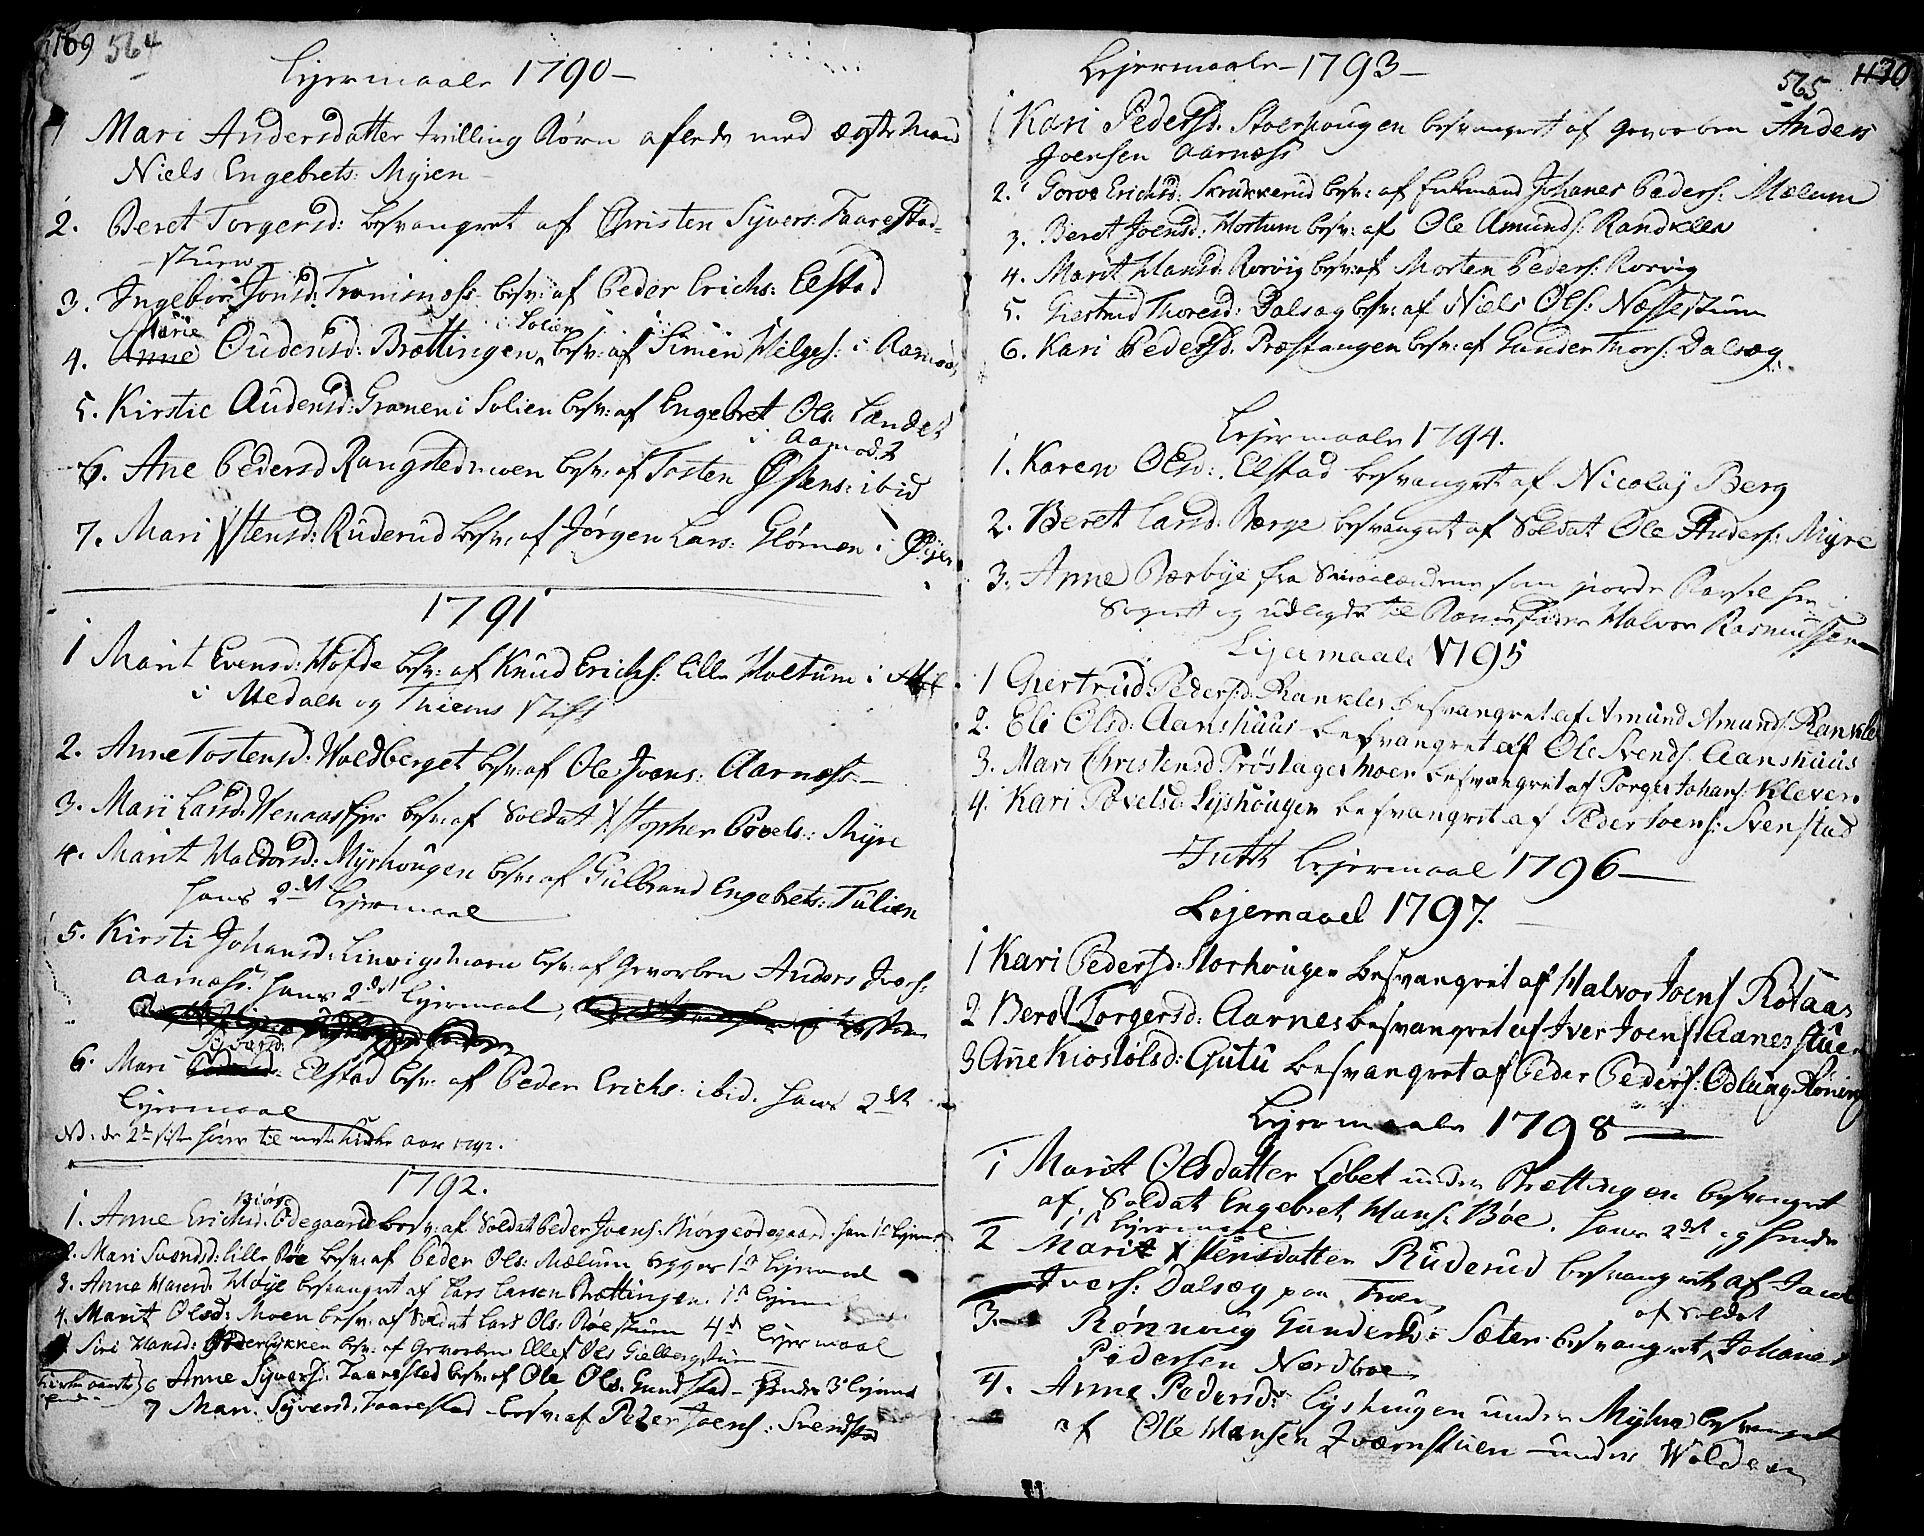 SAH, Ringebu prestekontor, Ministerialbok nr. 3, 1781-1820, s. 564-565